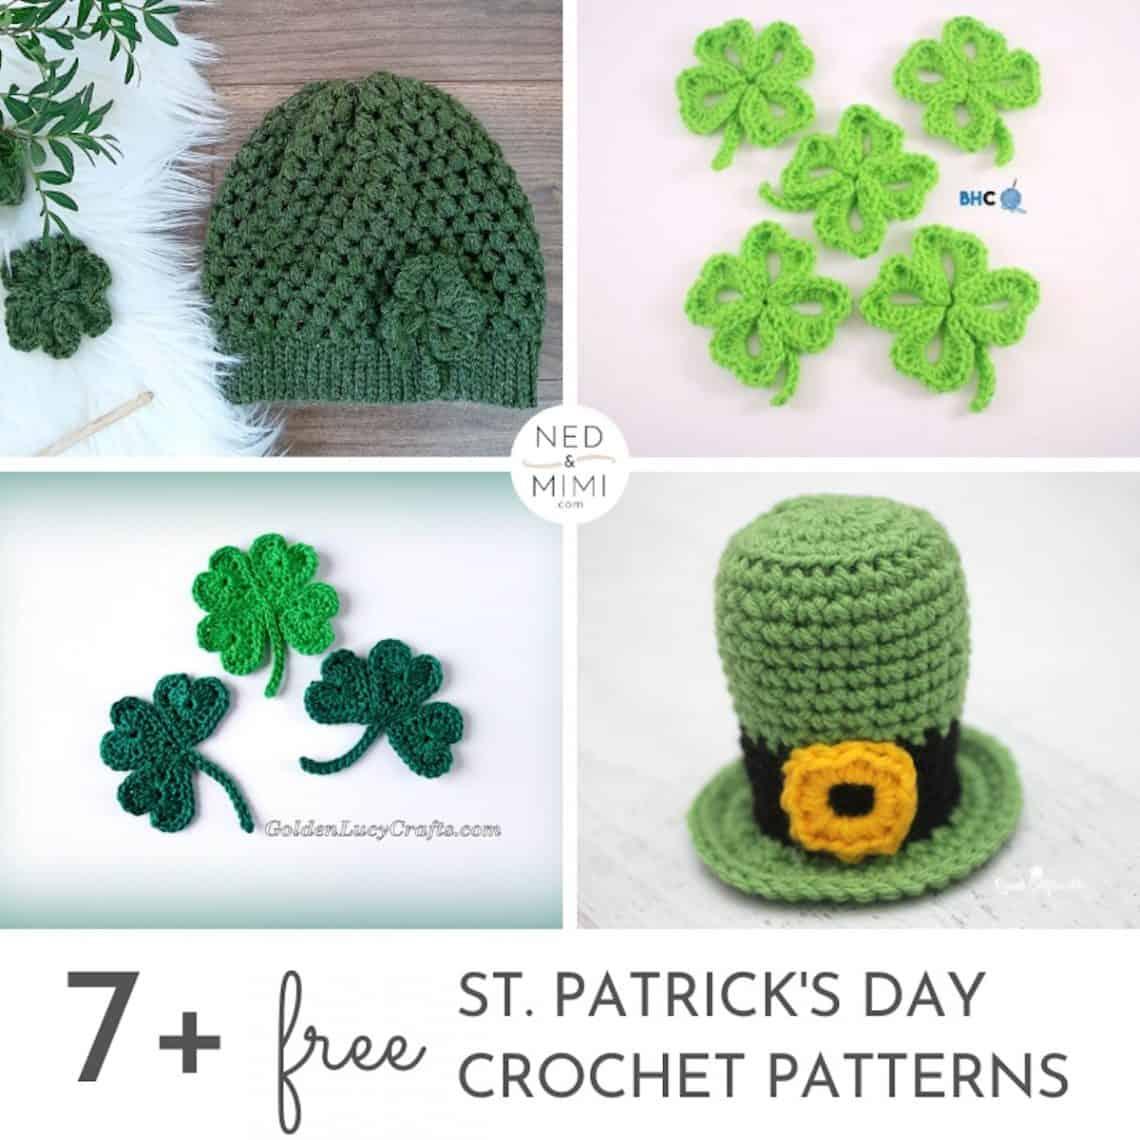 St. Patrick's Day Crochet Pattern collage + caption